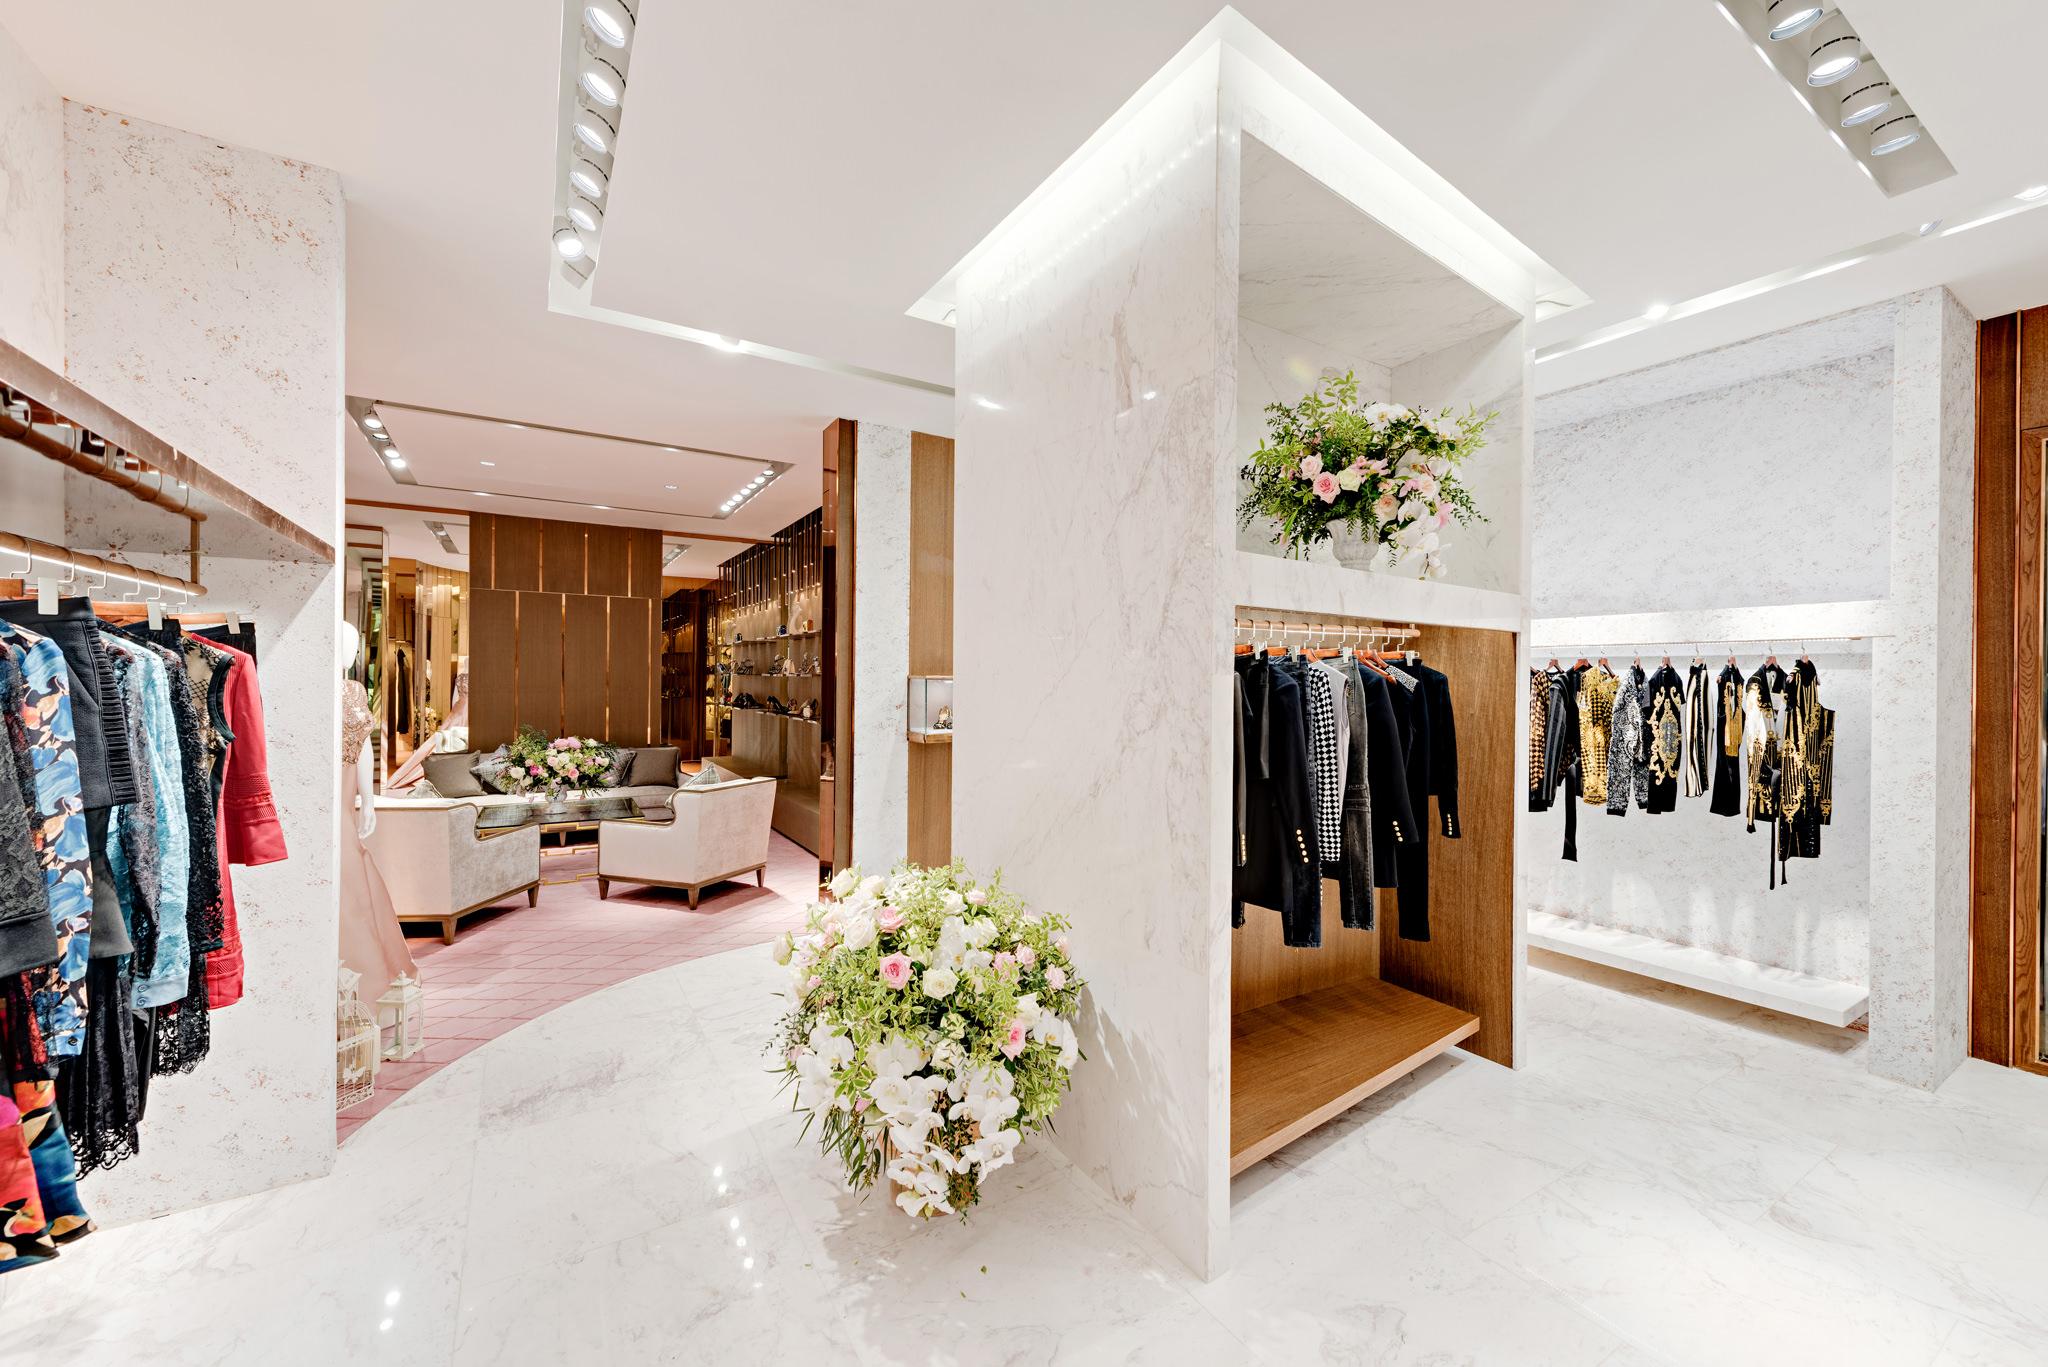 20161224 - Jacqueline - HCM - Commercial - Interior - Store - Retouch 0007.jpg